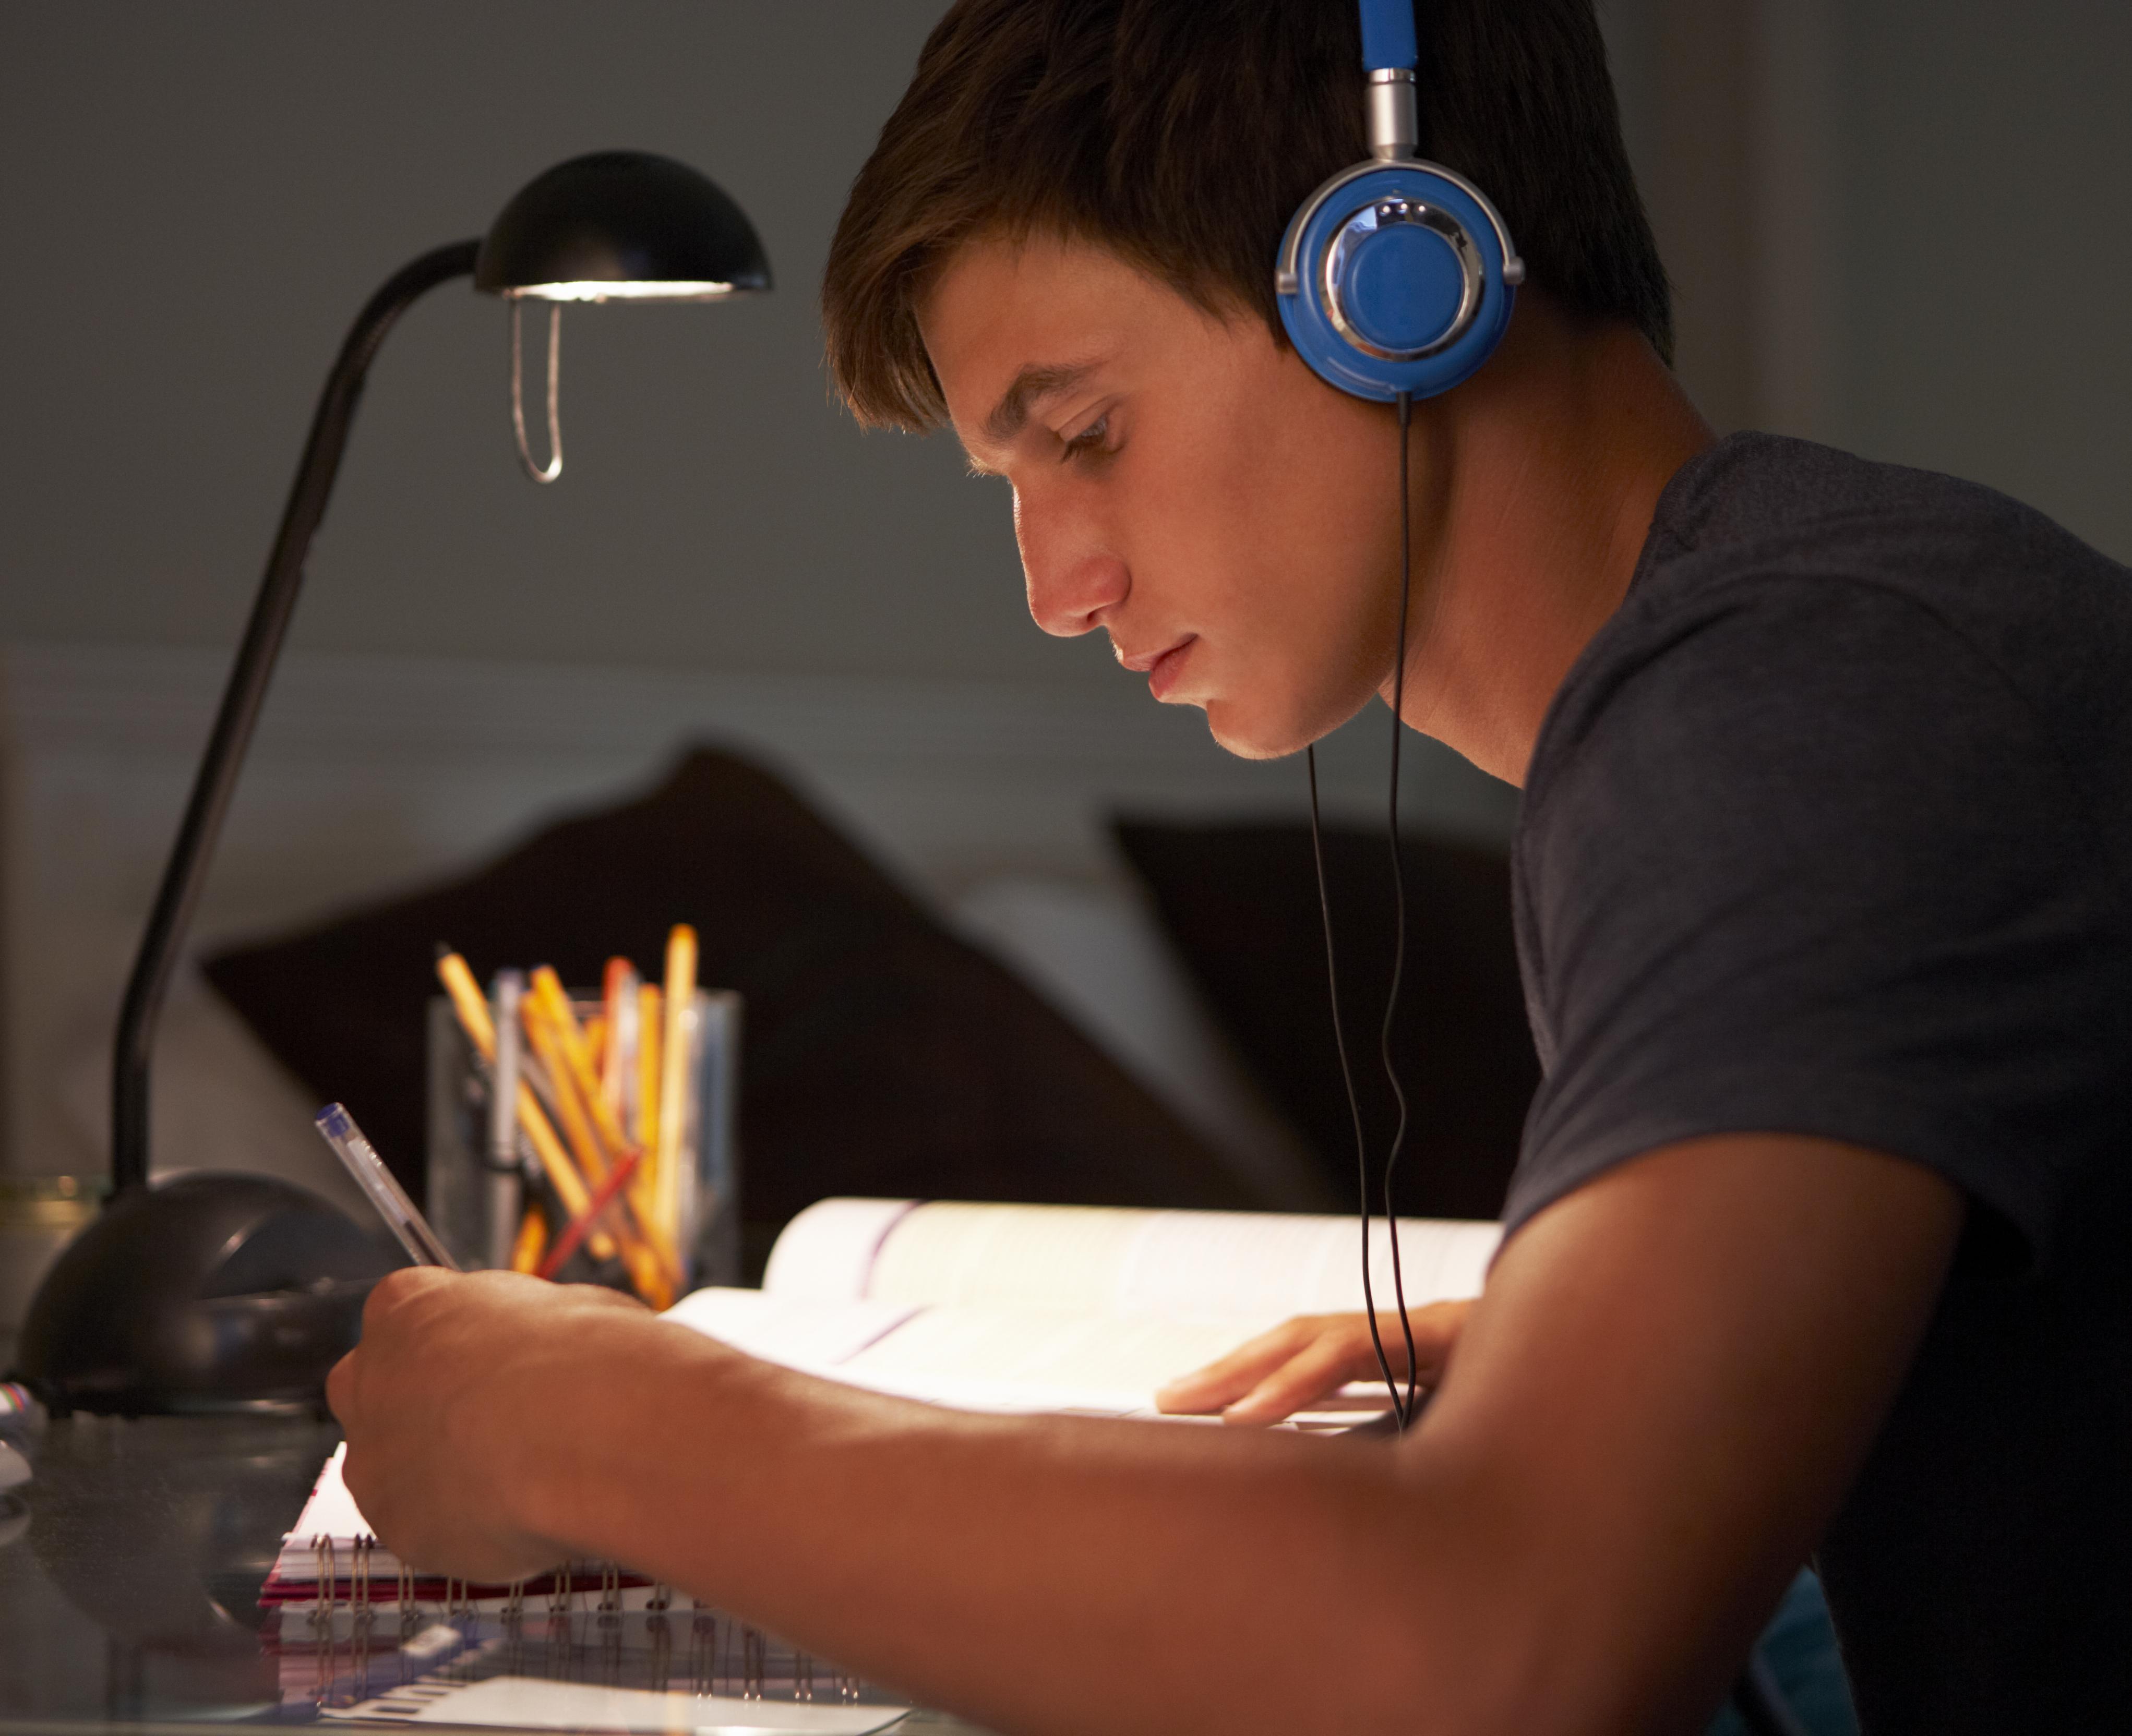 Musica para estudar playlist para estudantes de Medicina